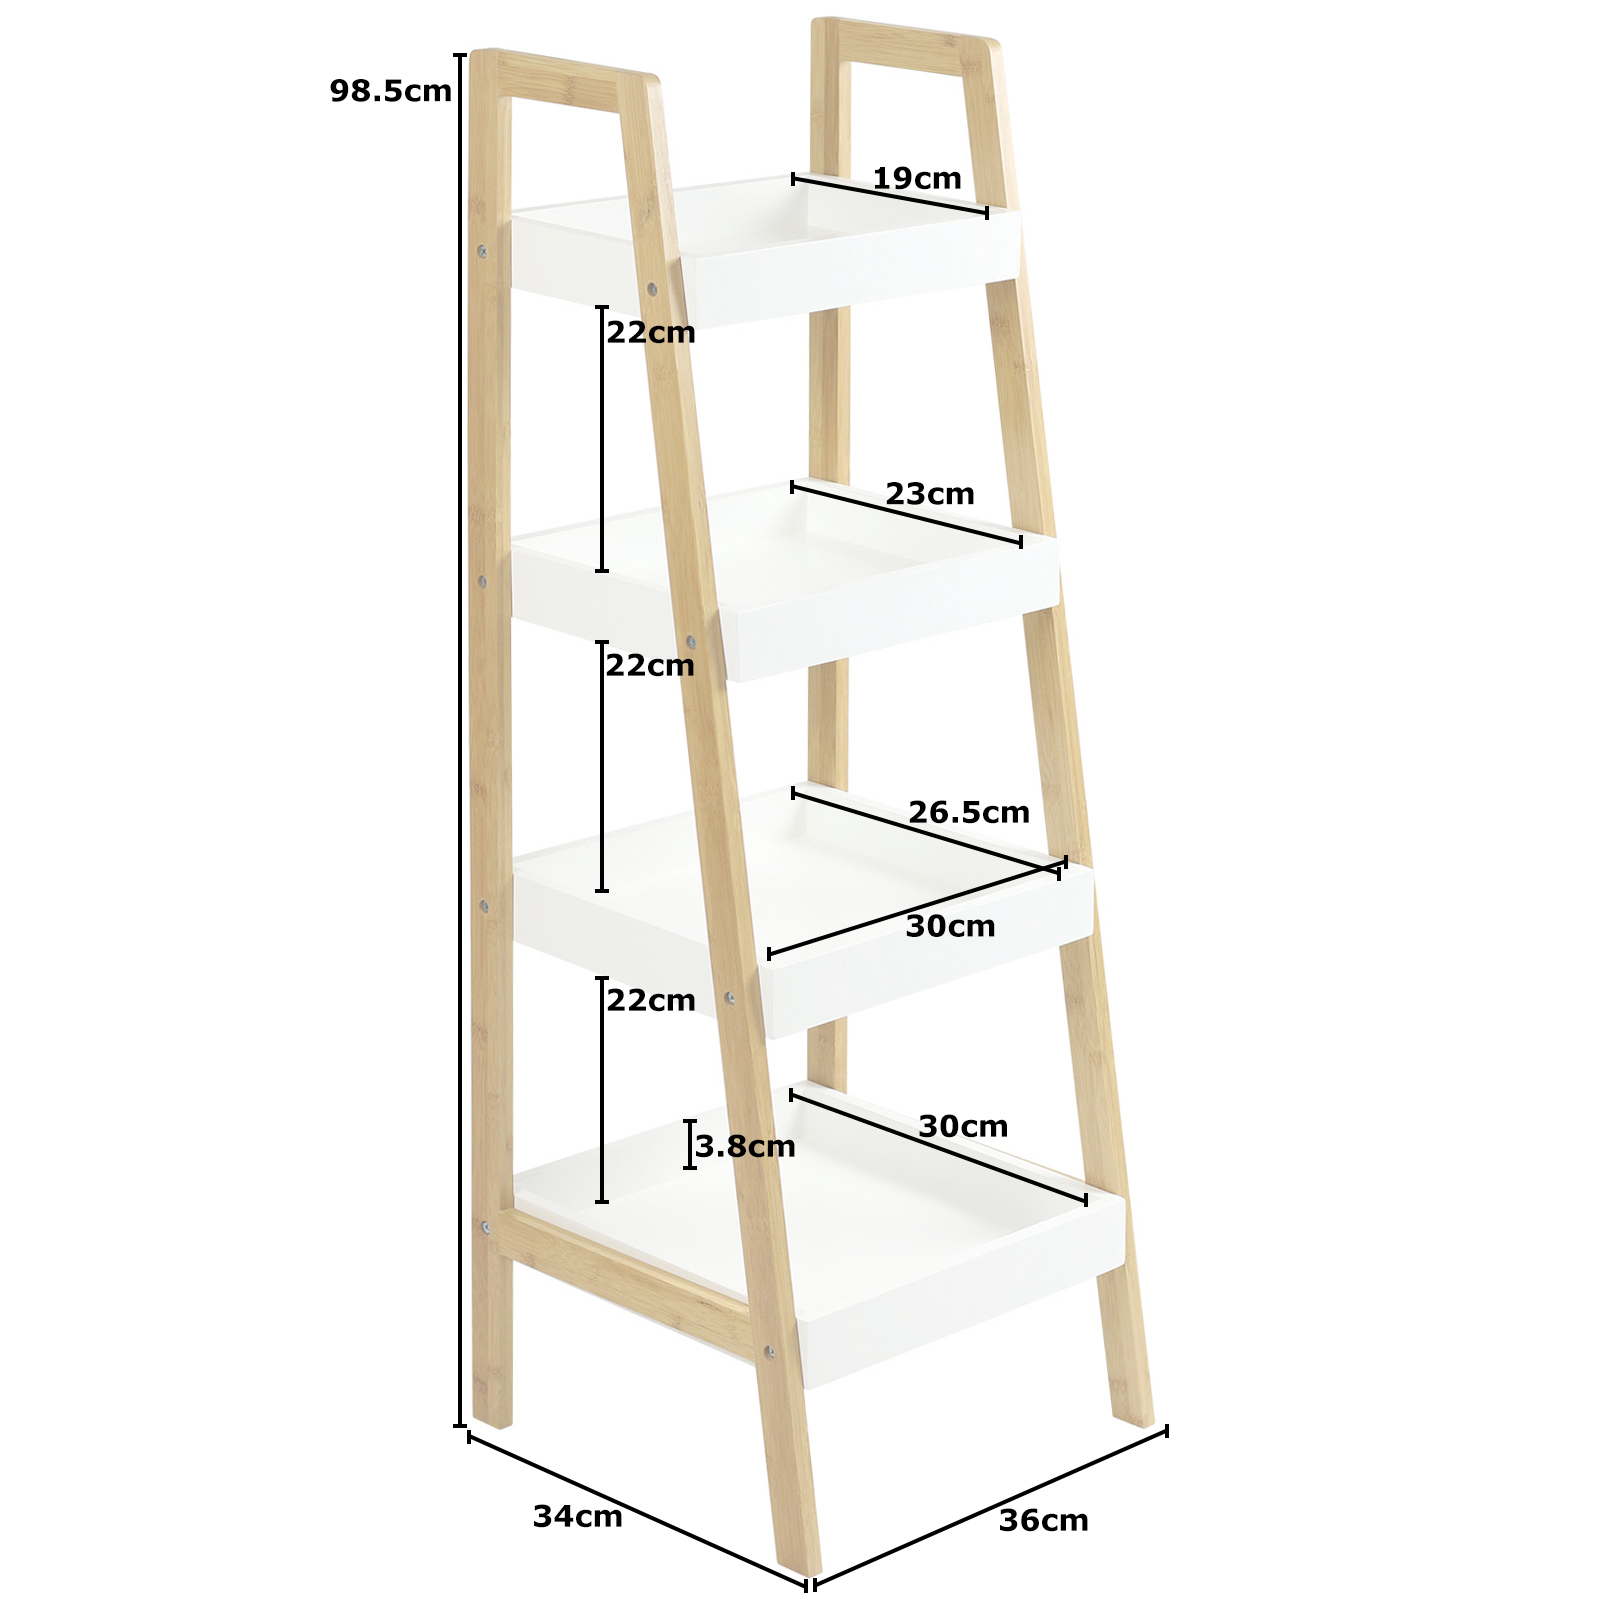 hartleys schräges treppen regal standregal bücherregal weiß/bambus